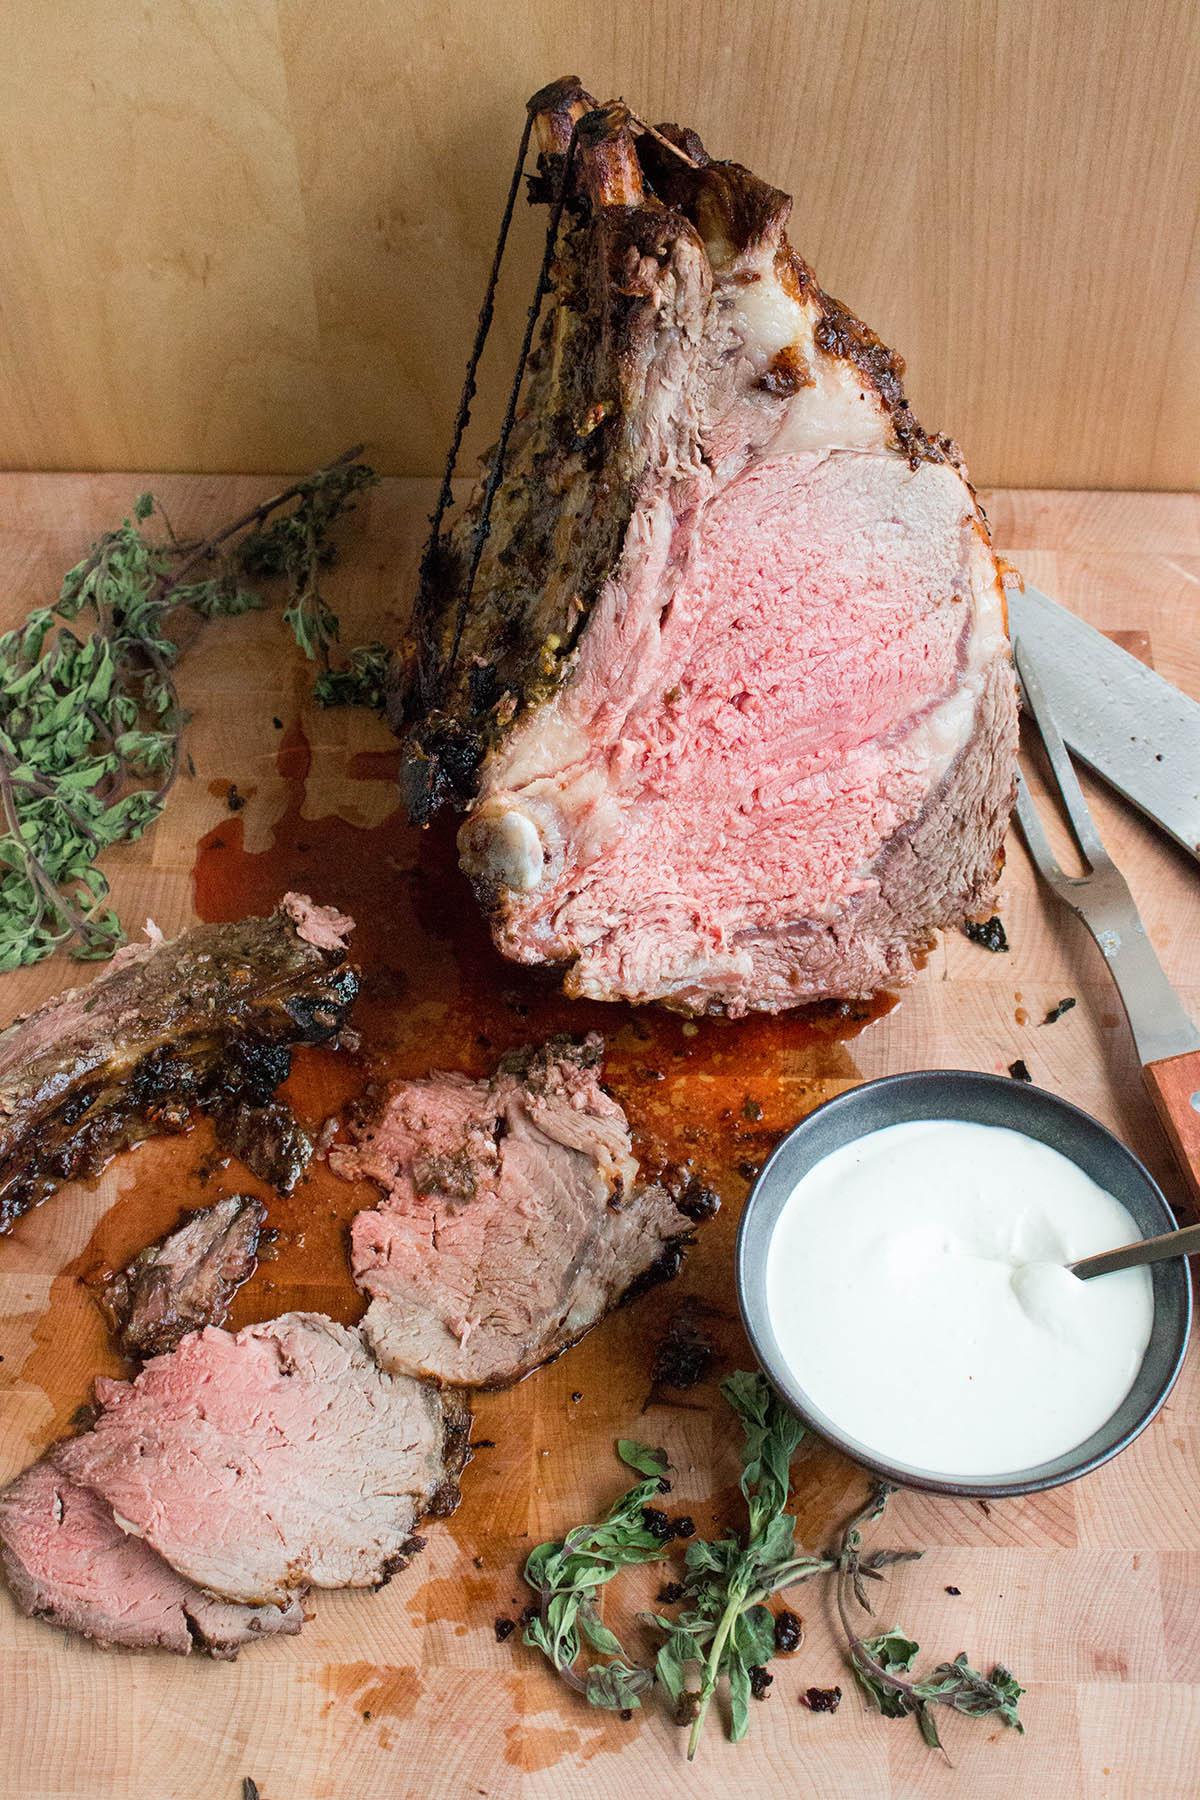 Chili Rubbed Prime Rib Roast With Horseradish Cream Sauce